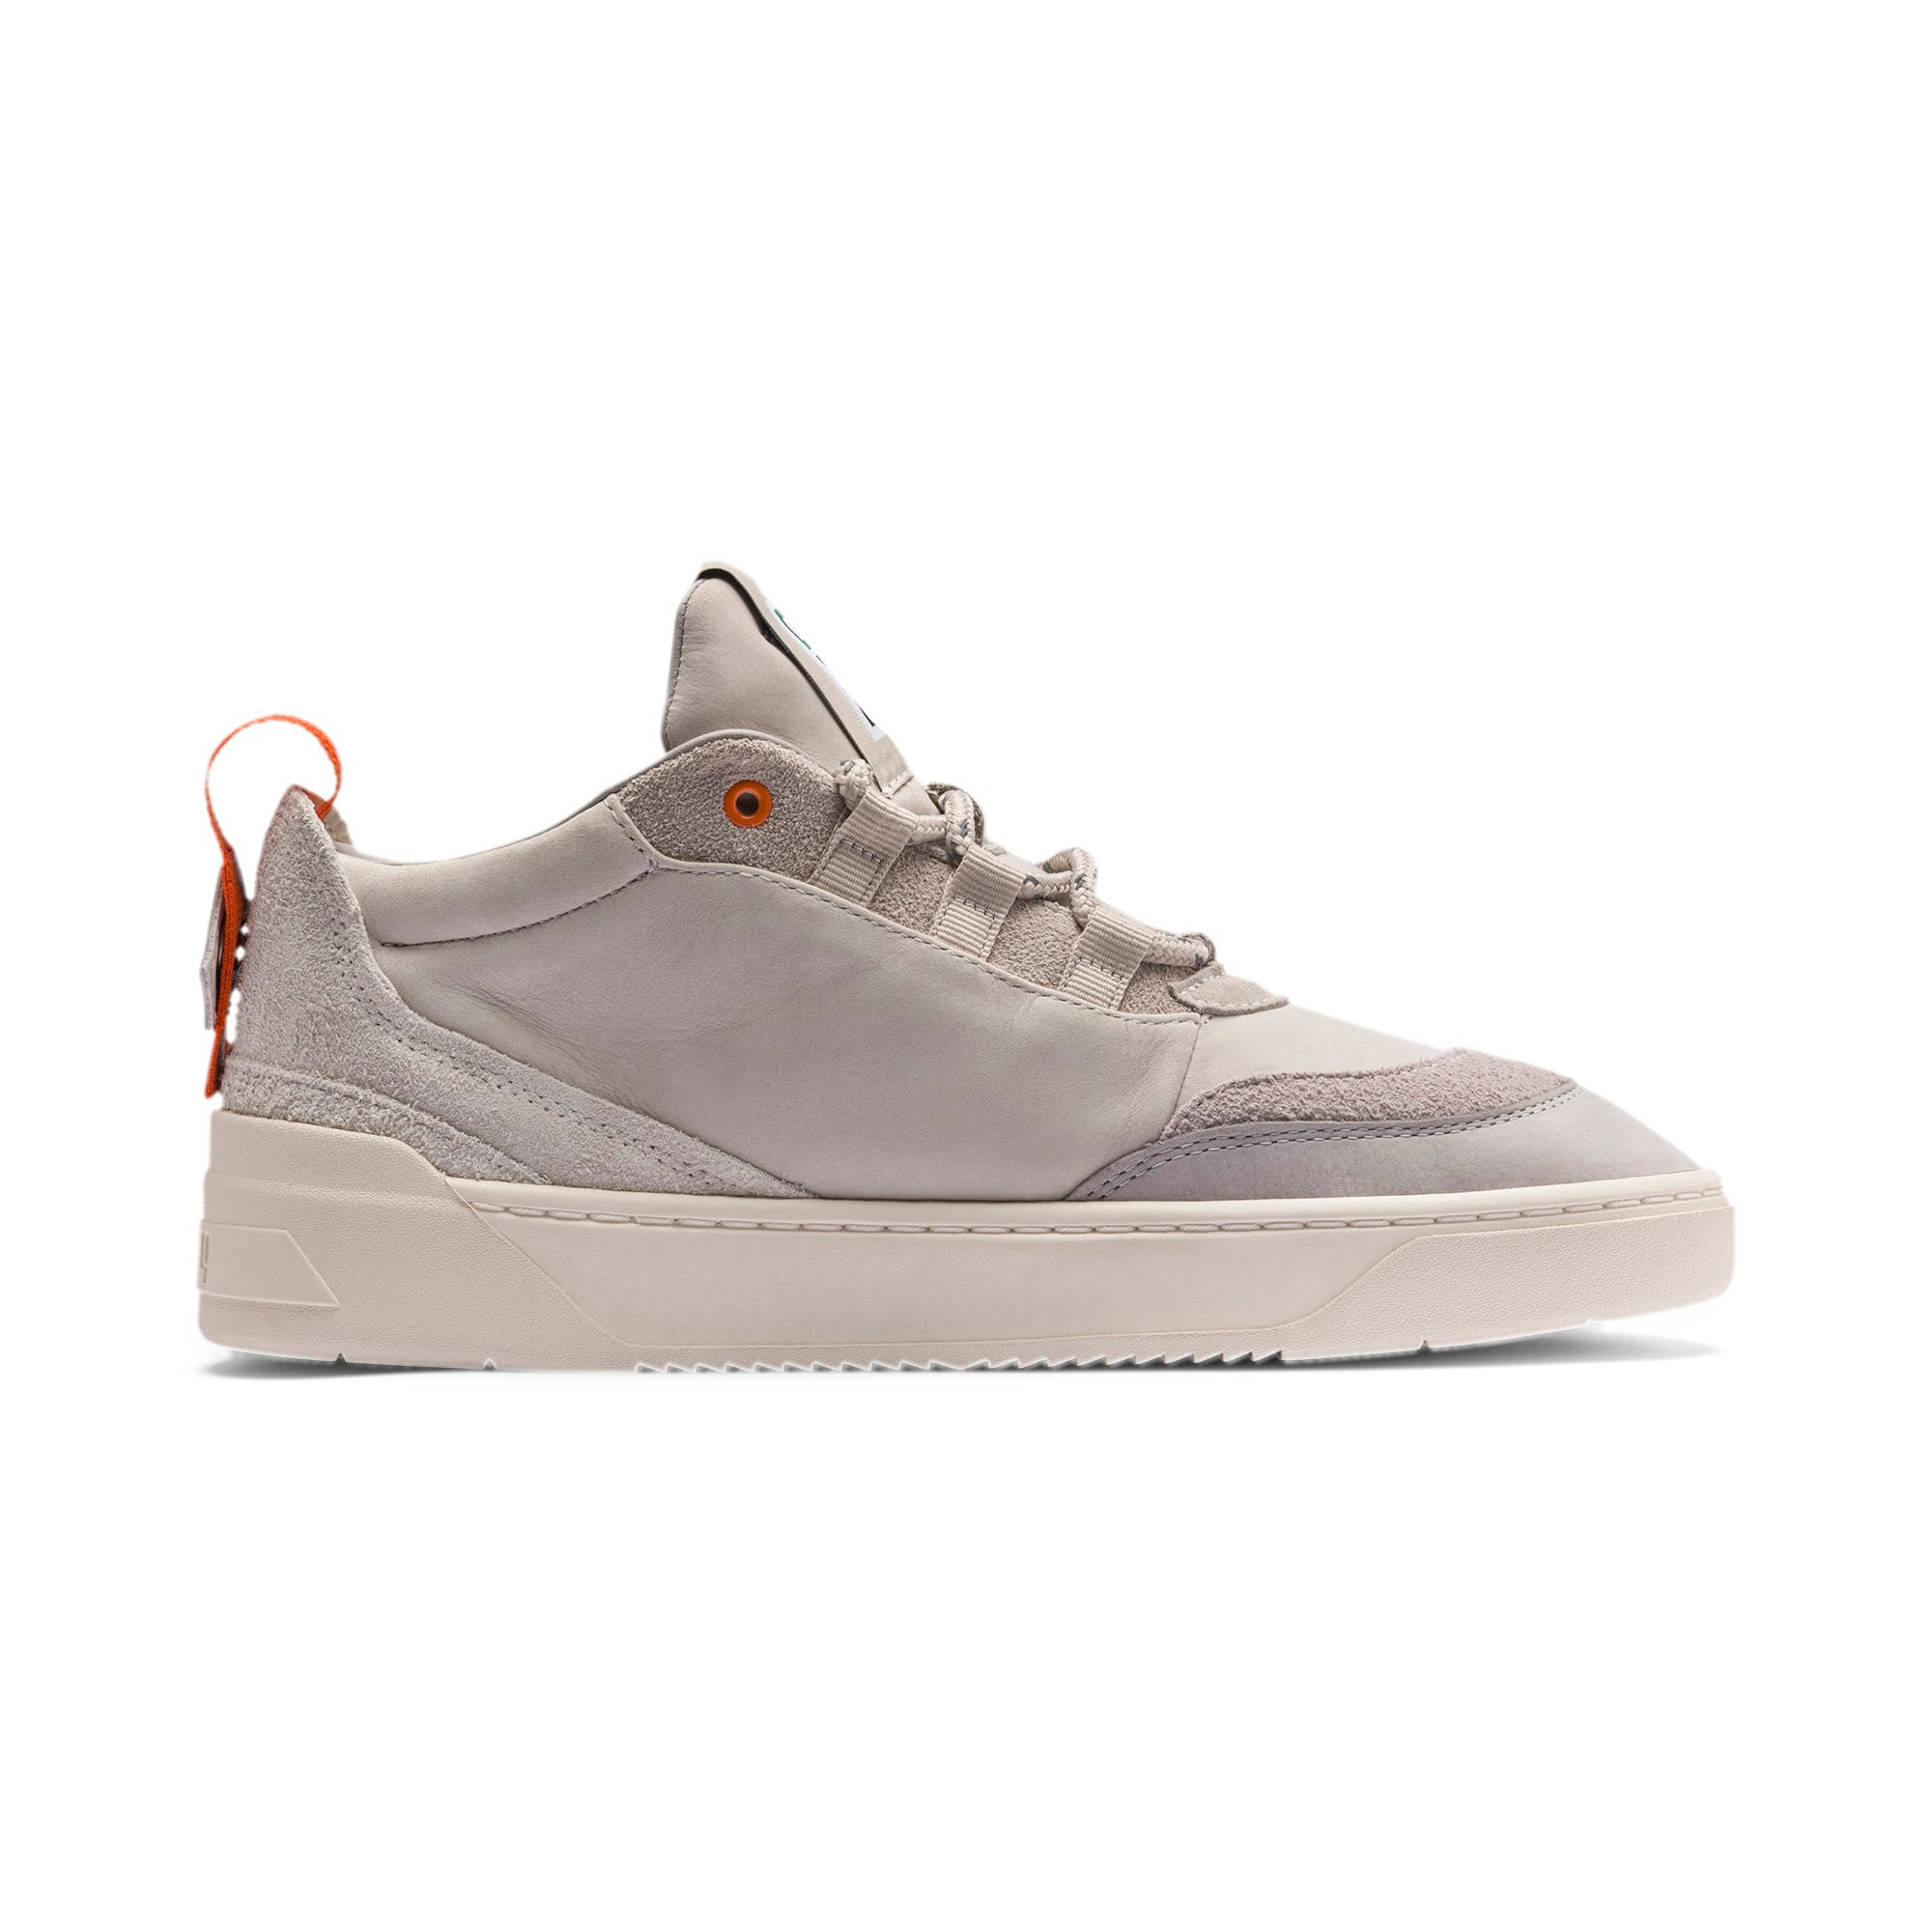 Imagen en miniatura 5 de Zapatillas Cali Zero Demi Beige, Satellite-Silver Gray, mediana